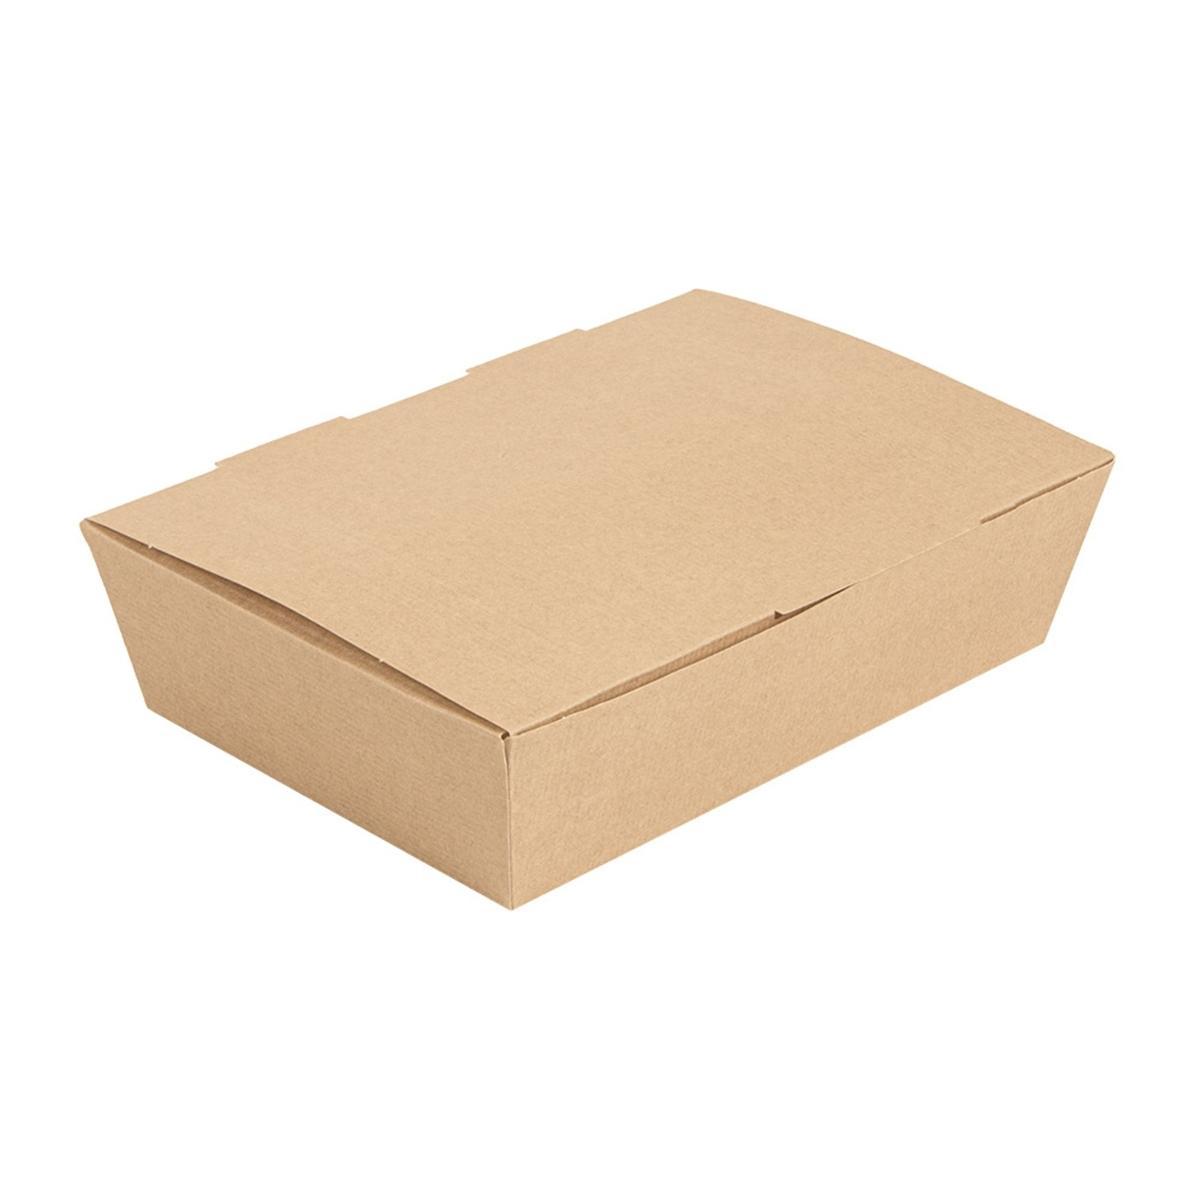 BOX LUNCH KRAFT THEPACK - 200x140x50 MM